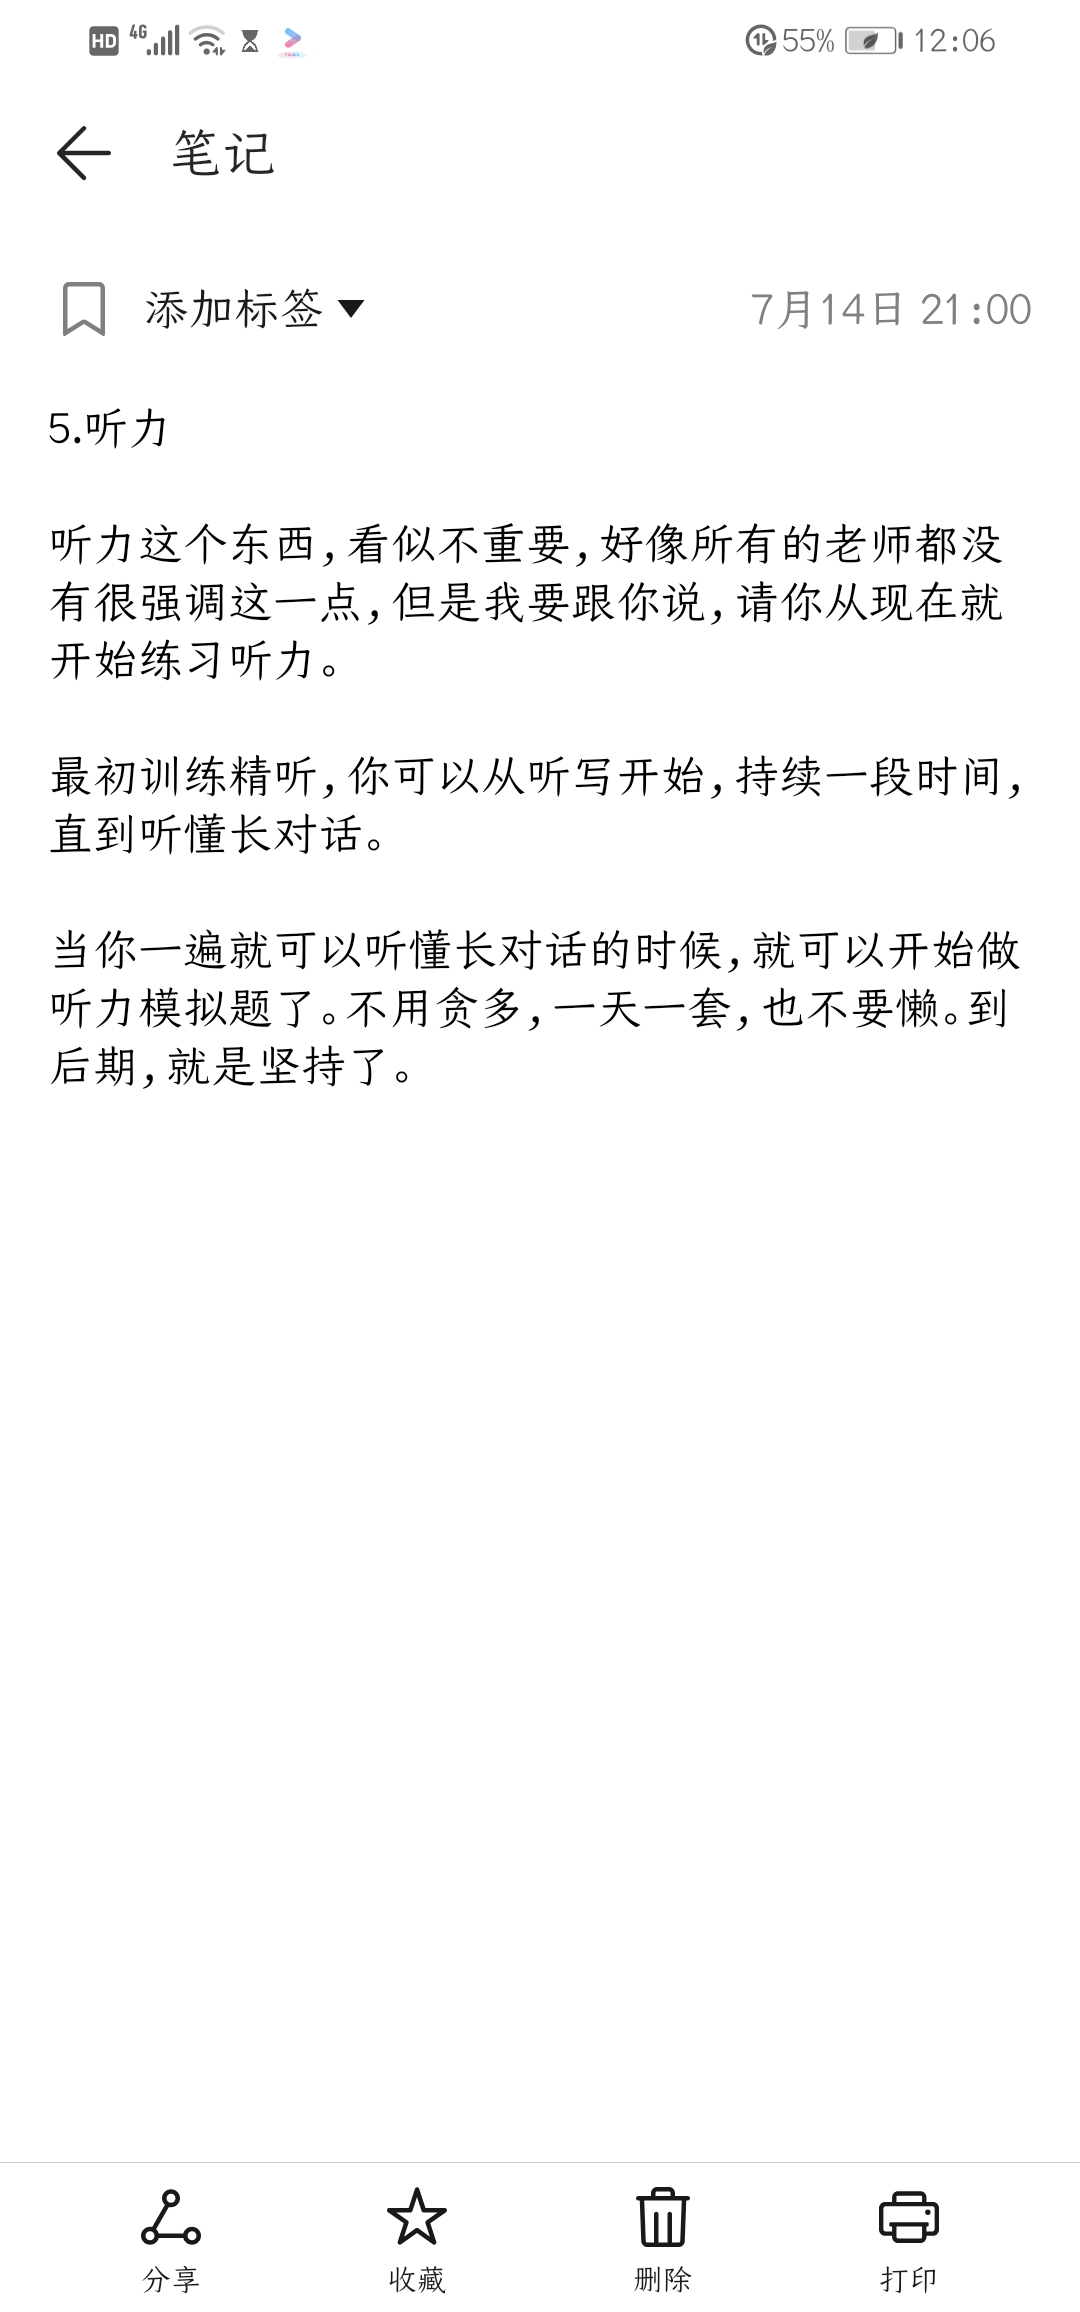 Screenshot_20190715_120644_com.example.android.notepad.jpg